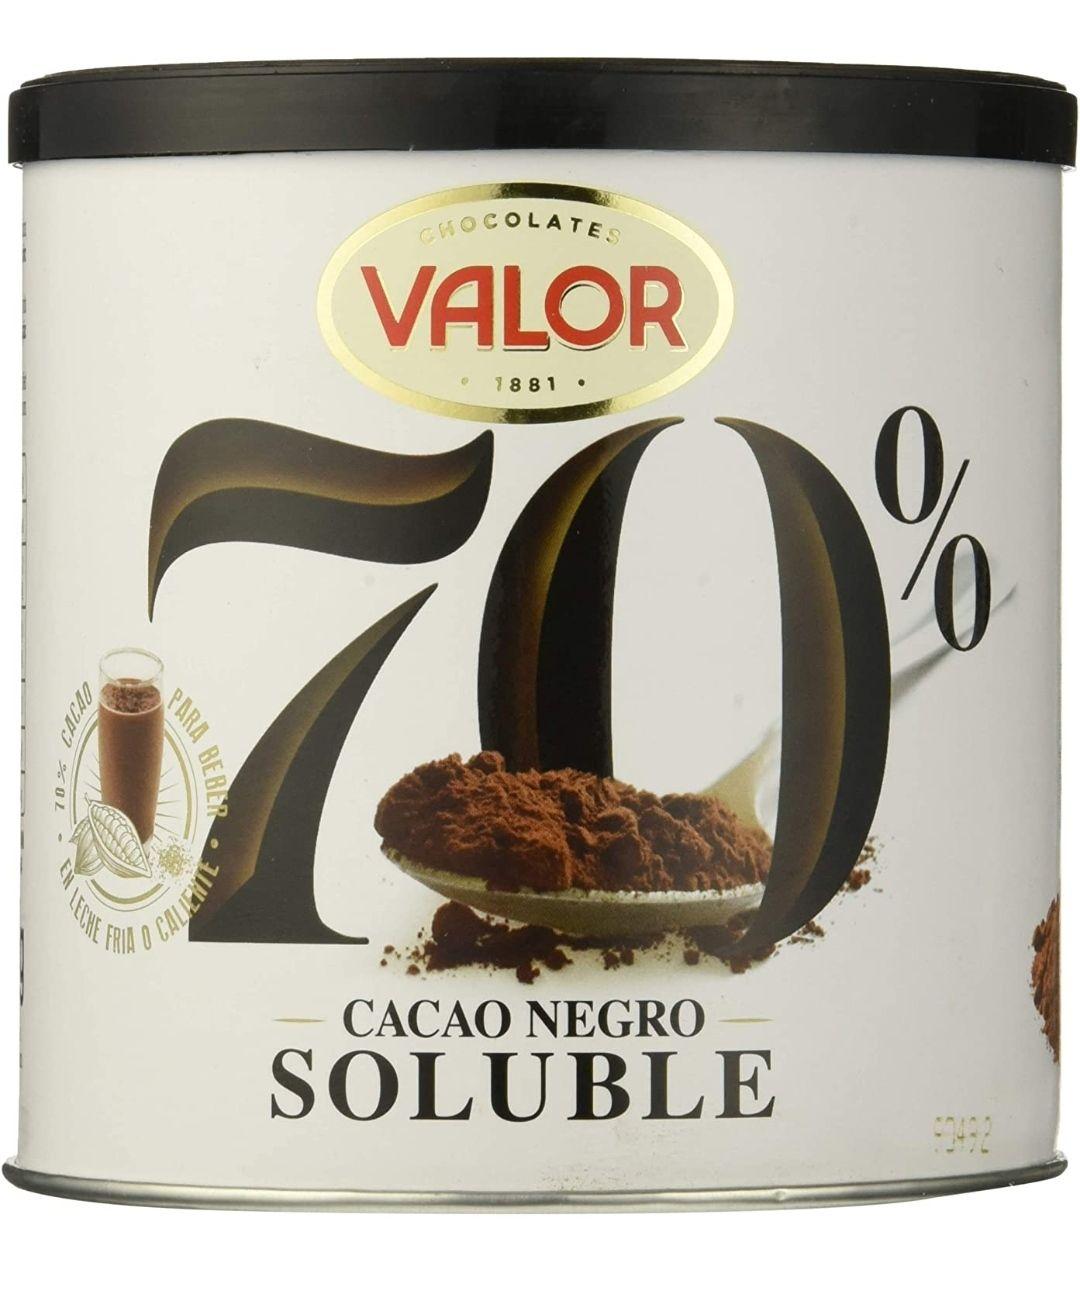 Pack de 6 x 300gramos de Valor Cacao Soluble Negro 70%, (Total 1800 g)